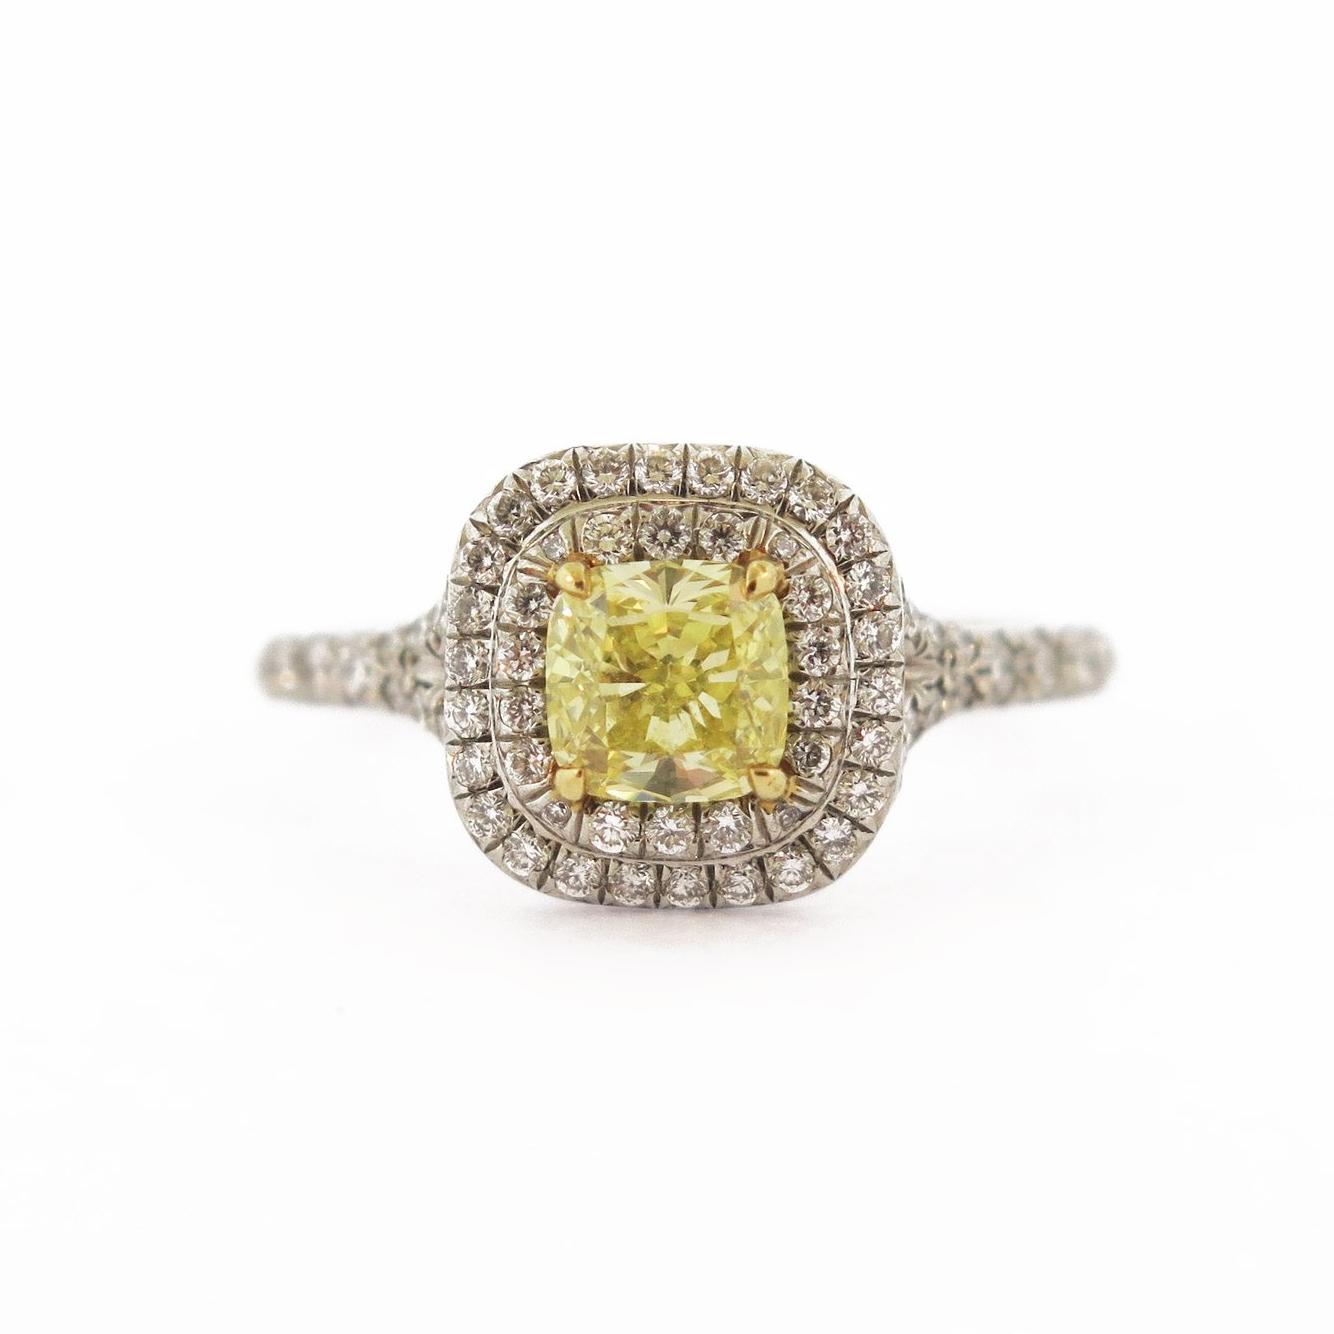 Tiffany & Co. Yellow Diamond Ring